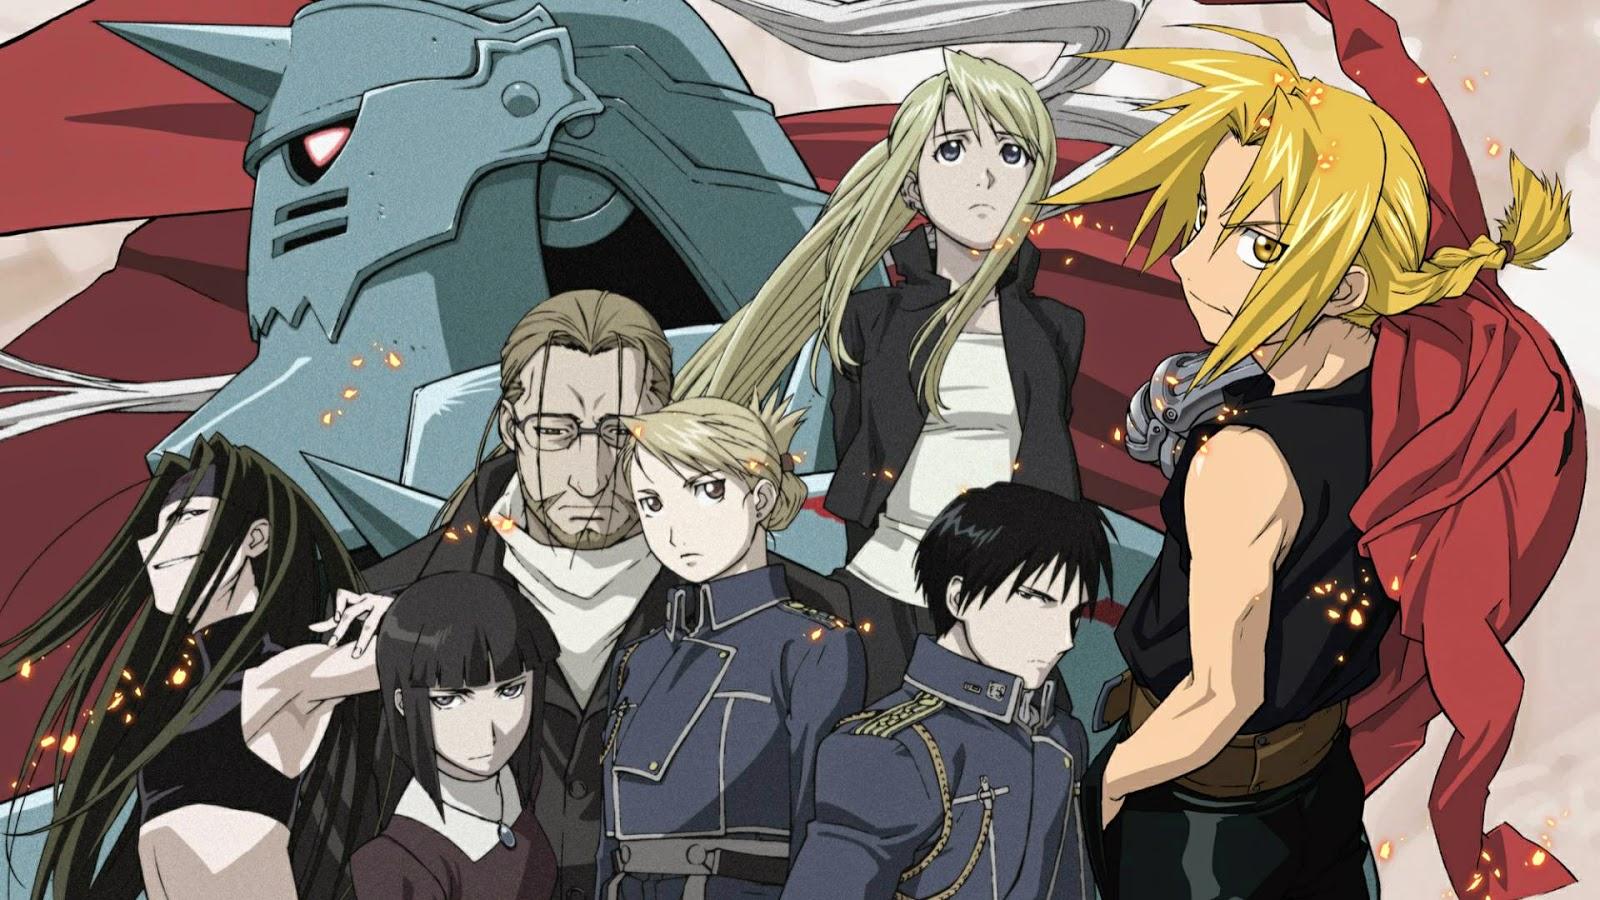 Kết quả hình ảnh cho Fullmetal Alchemist: Brotherhood